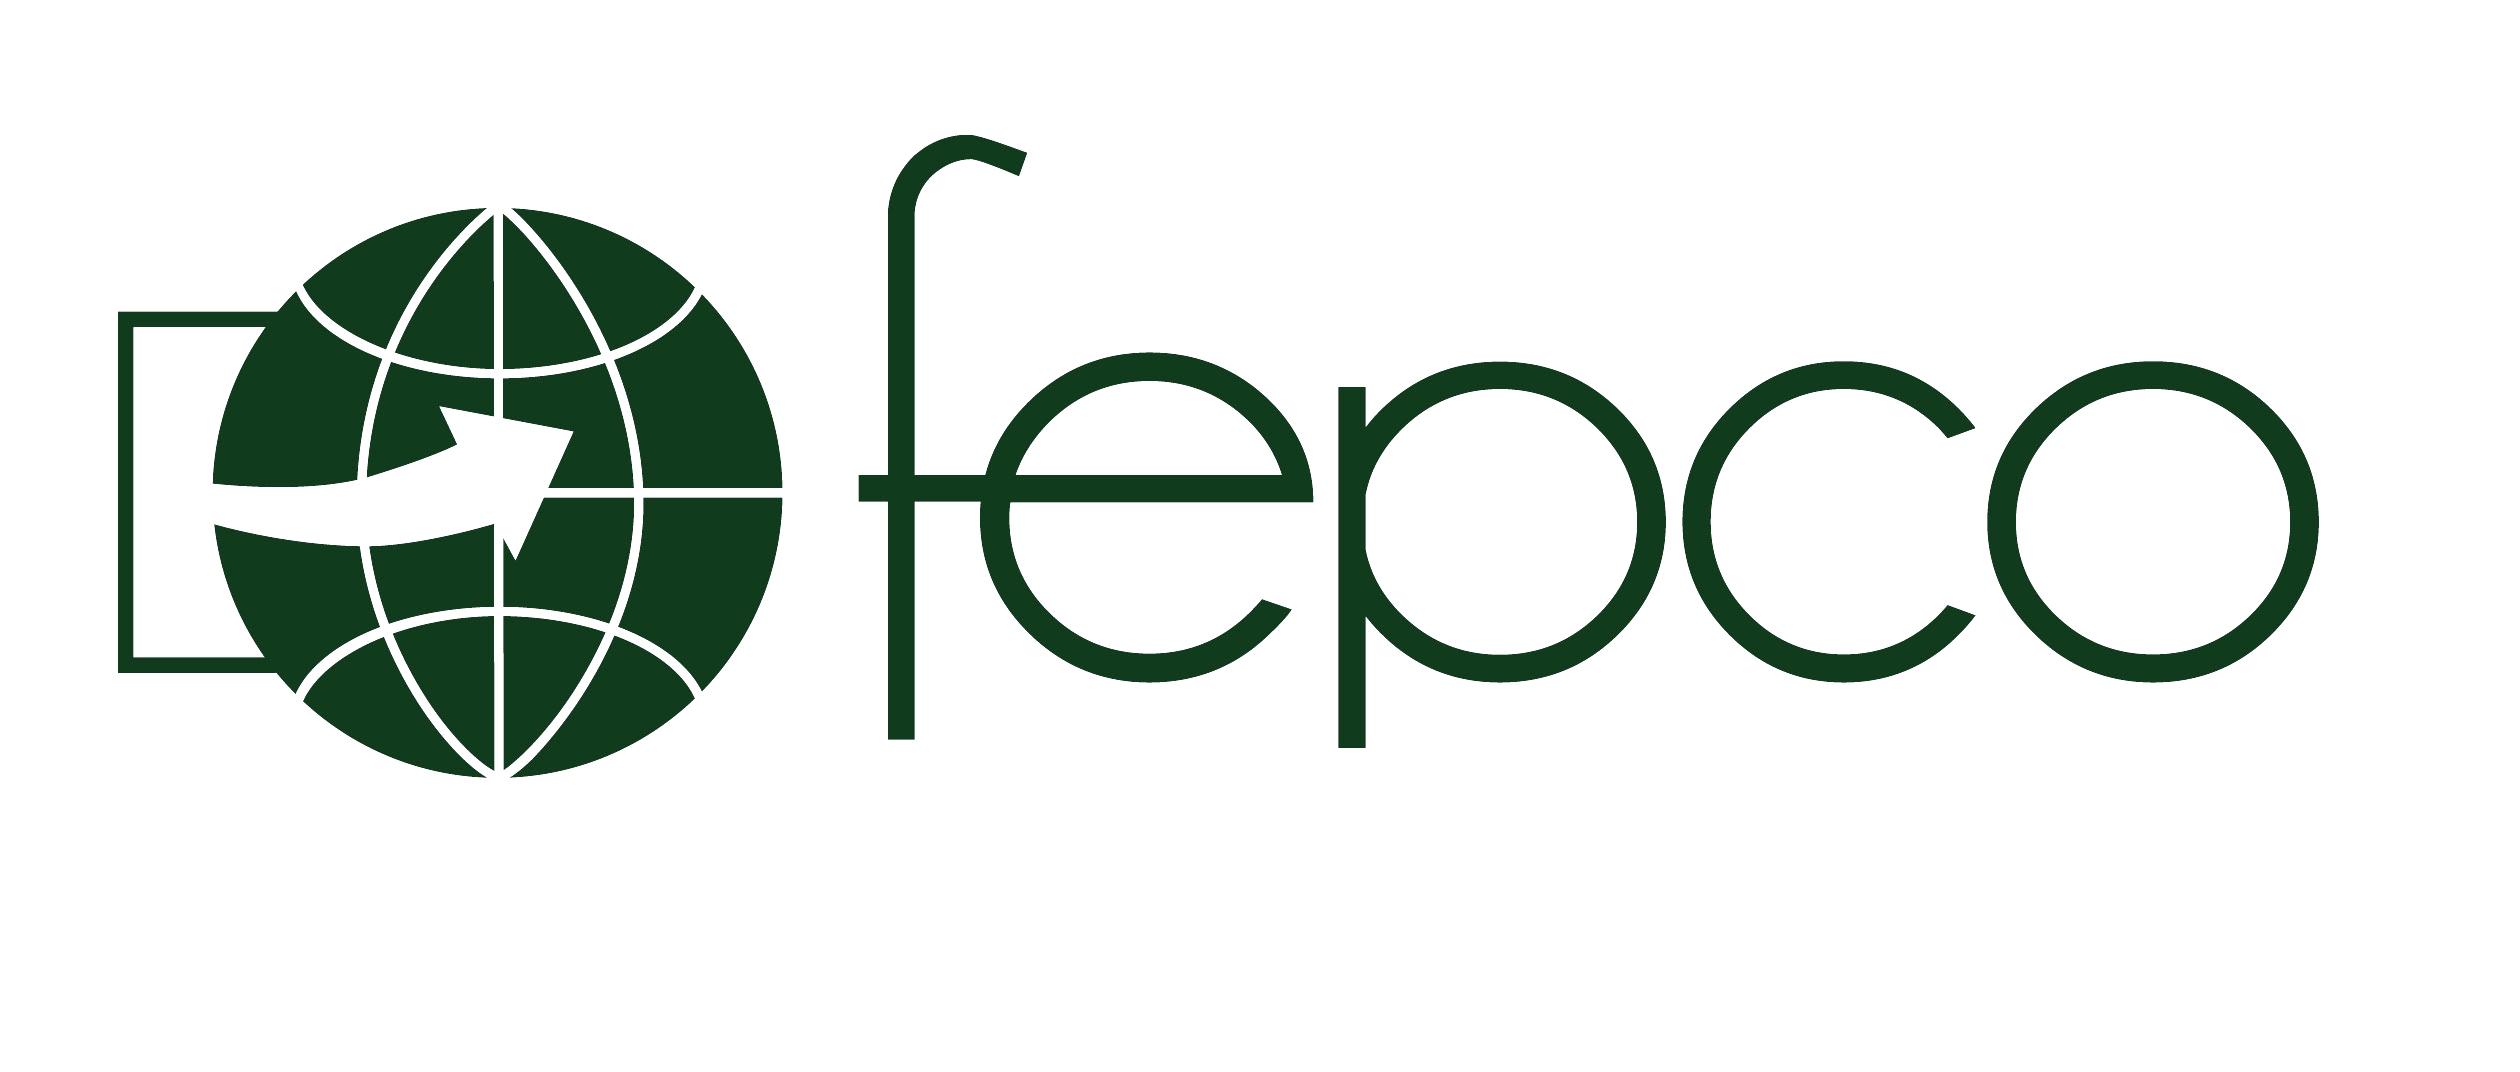 Fepco